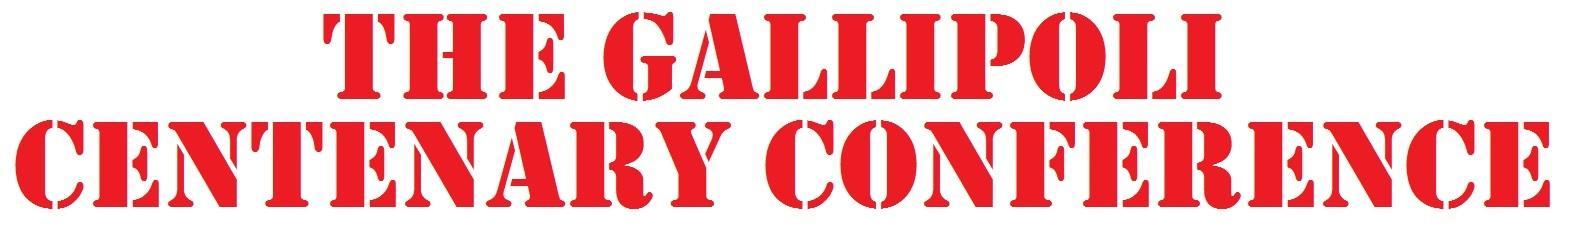 The Gallipoli Centenary Conference